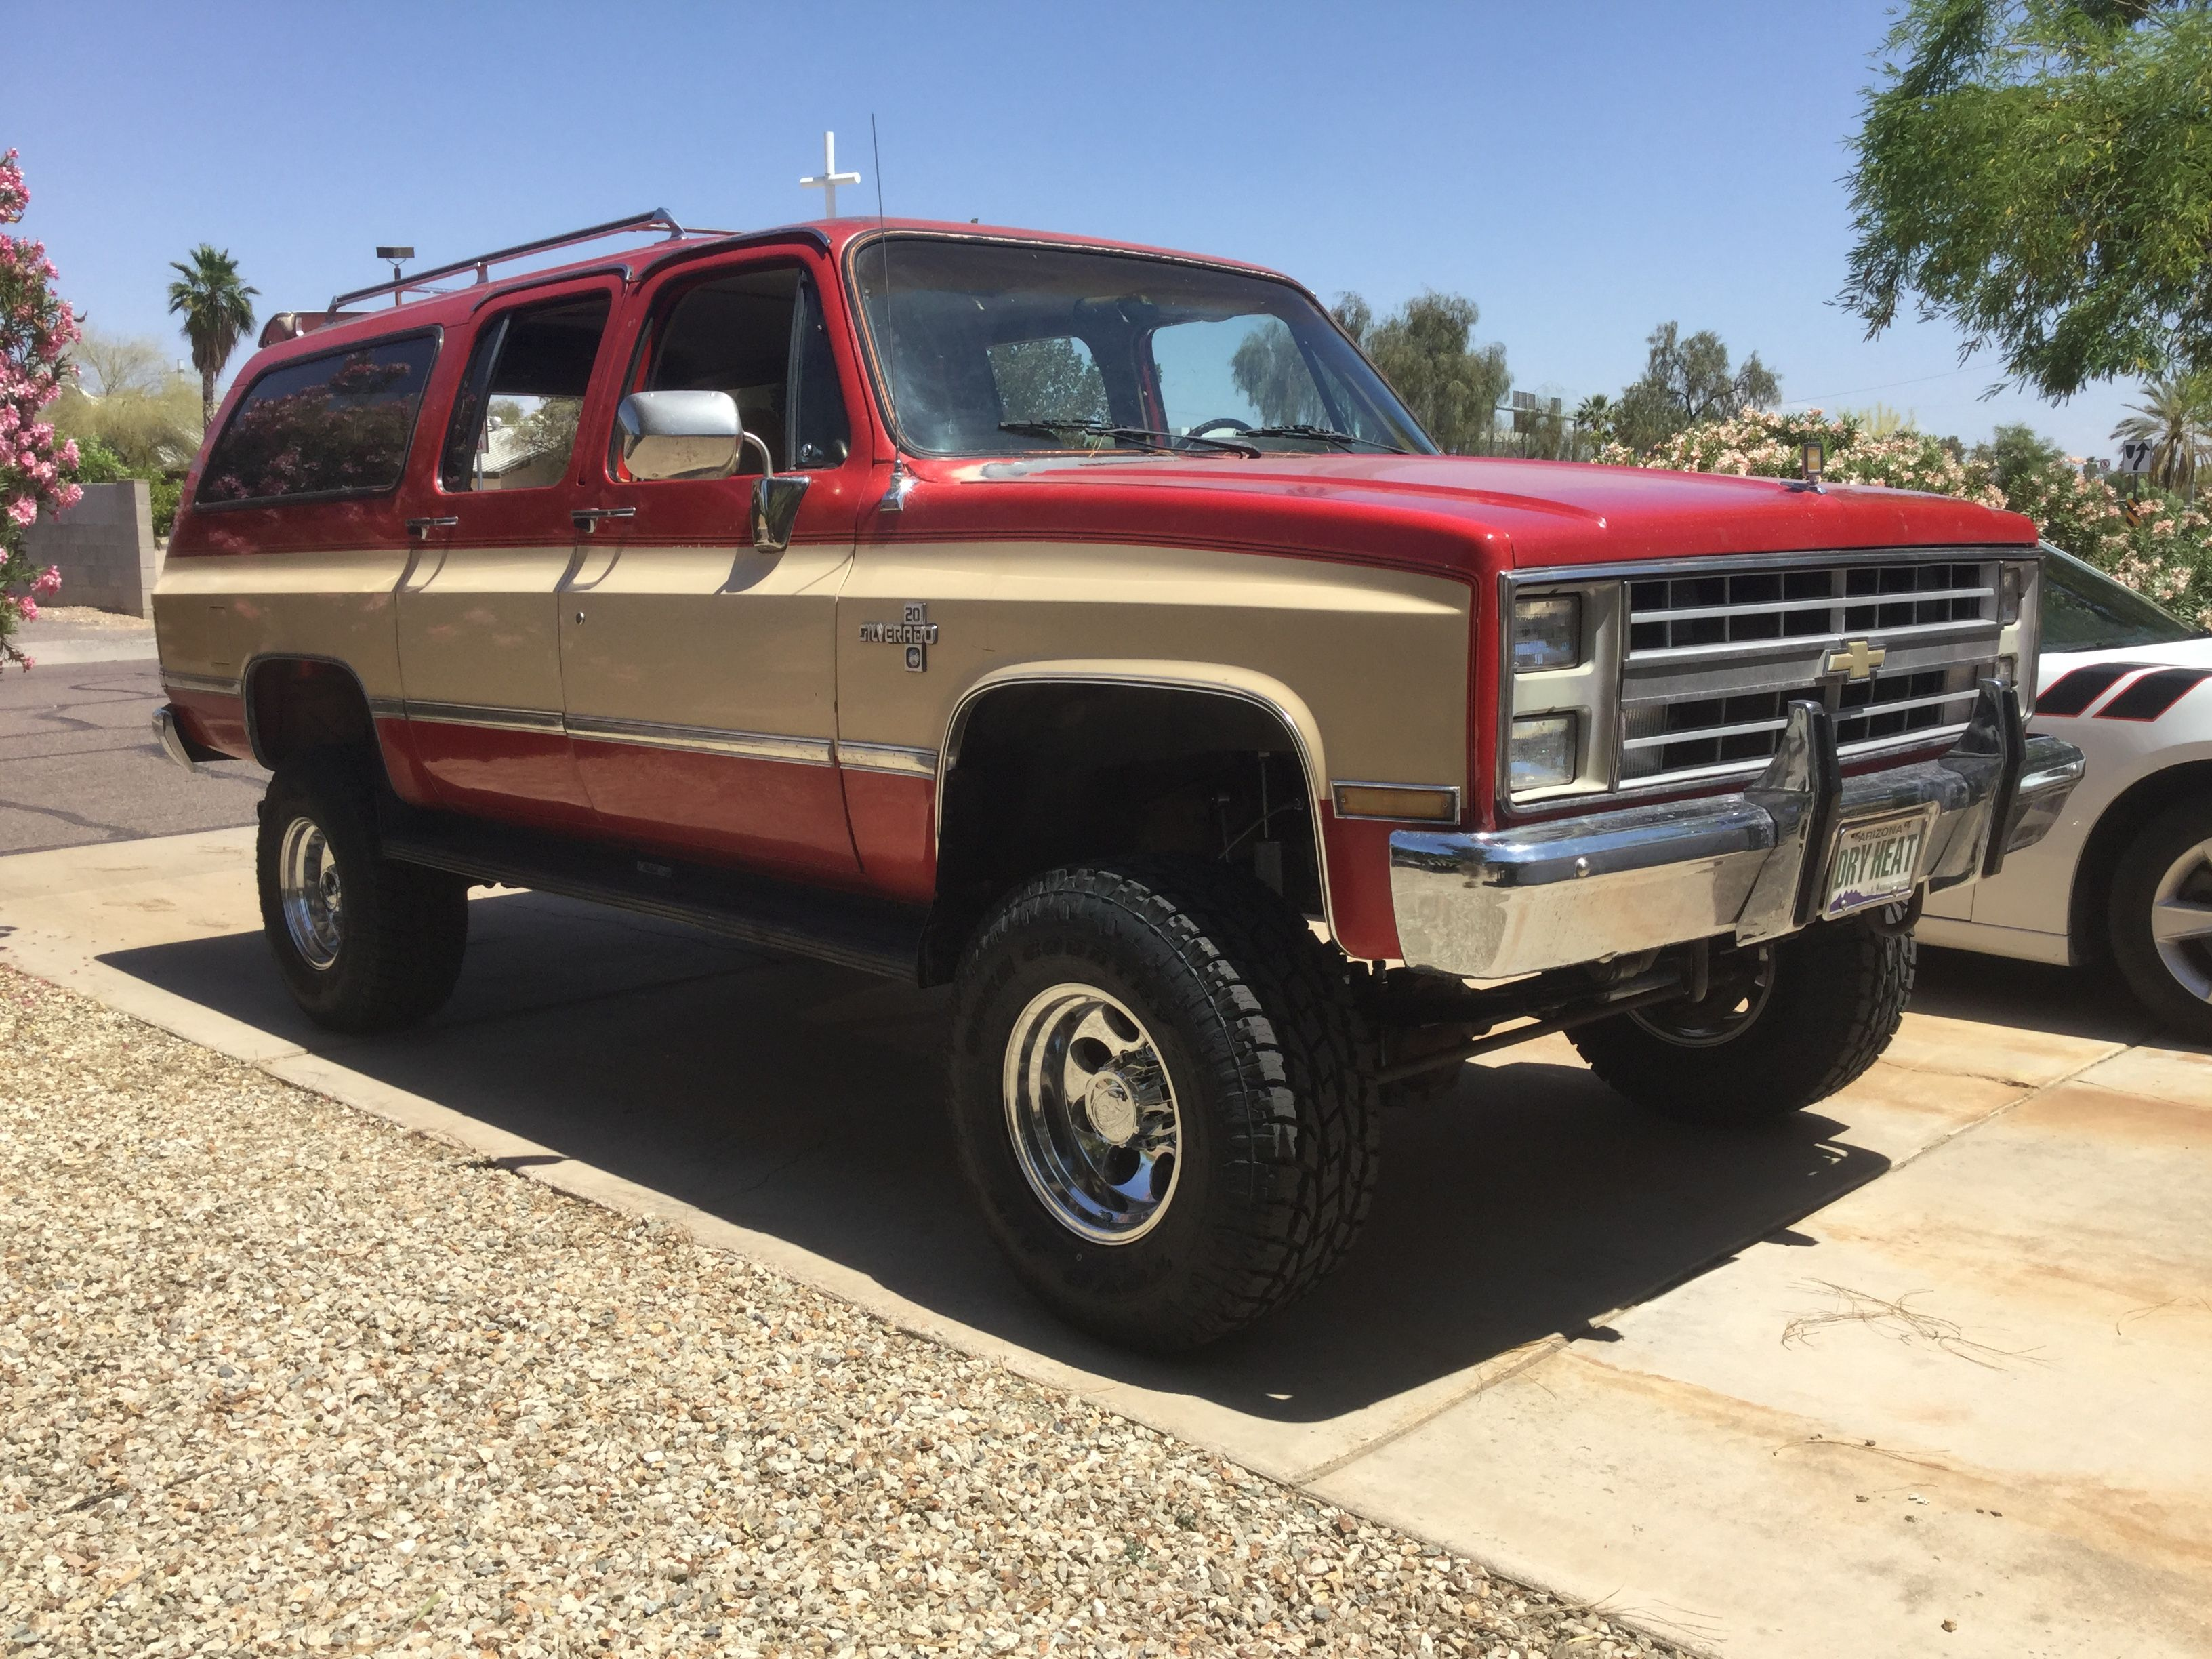 1985 chevrolet k20 suburban 4 rc spring lift 16x10 ion wheels 305 70 16 toyo tire s [ 3264 x 2448 Pixel ]